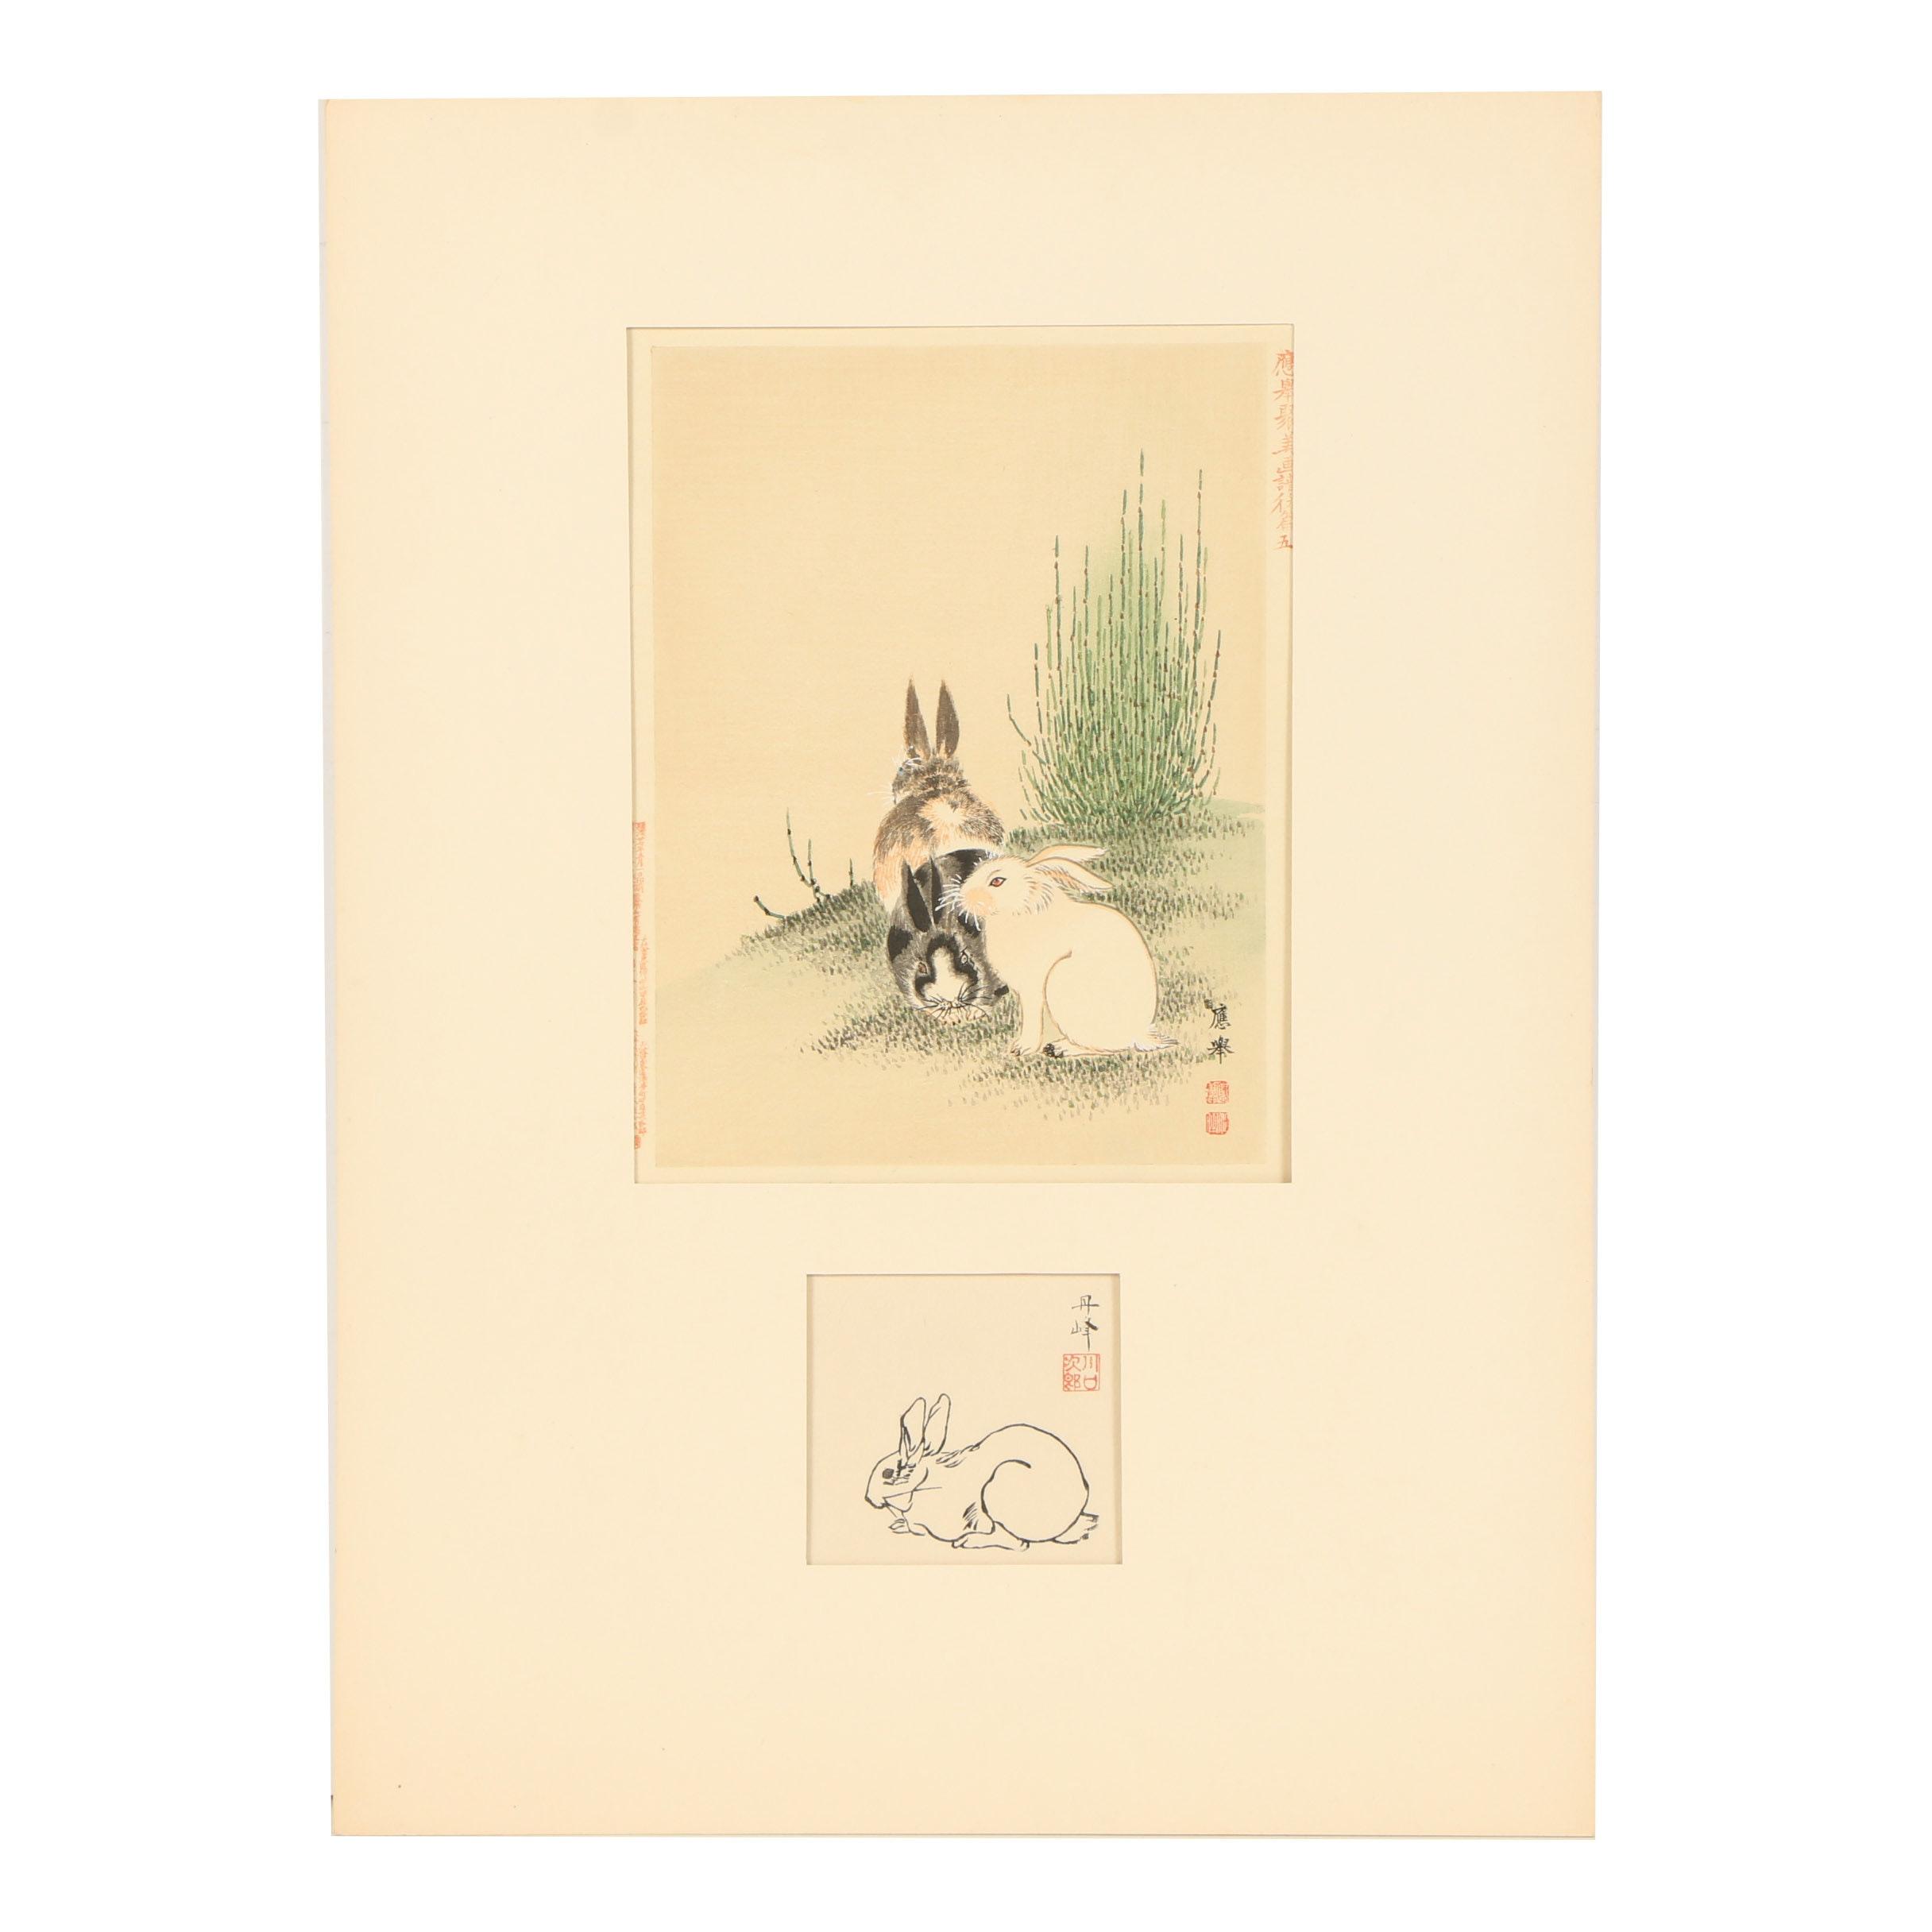 Woodblock Prints of Rabbits Including After Maruyama Ōkyo